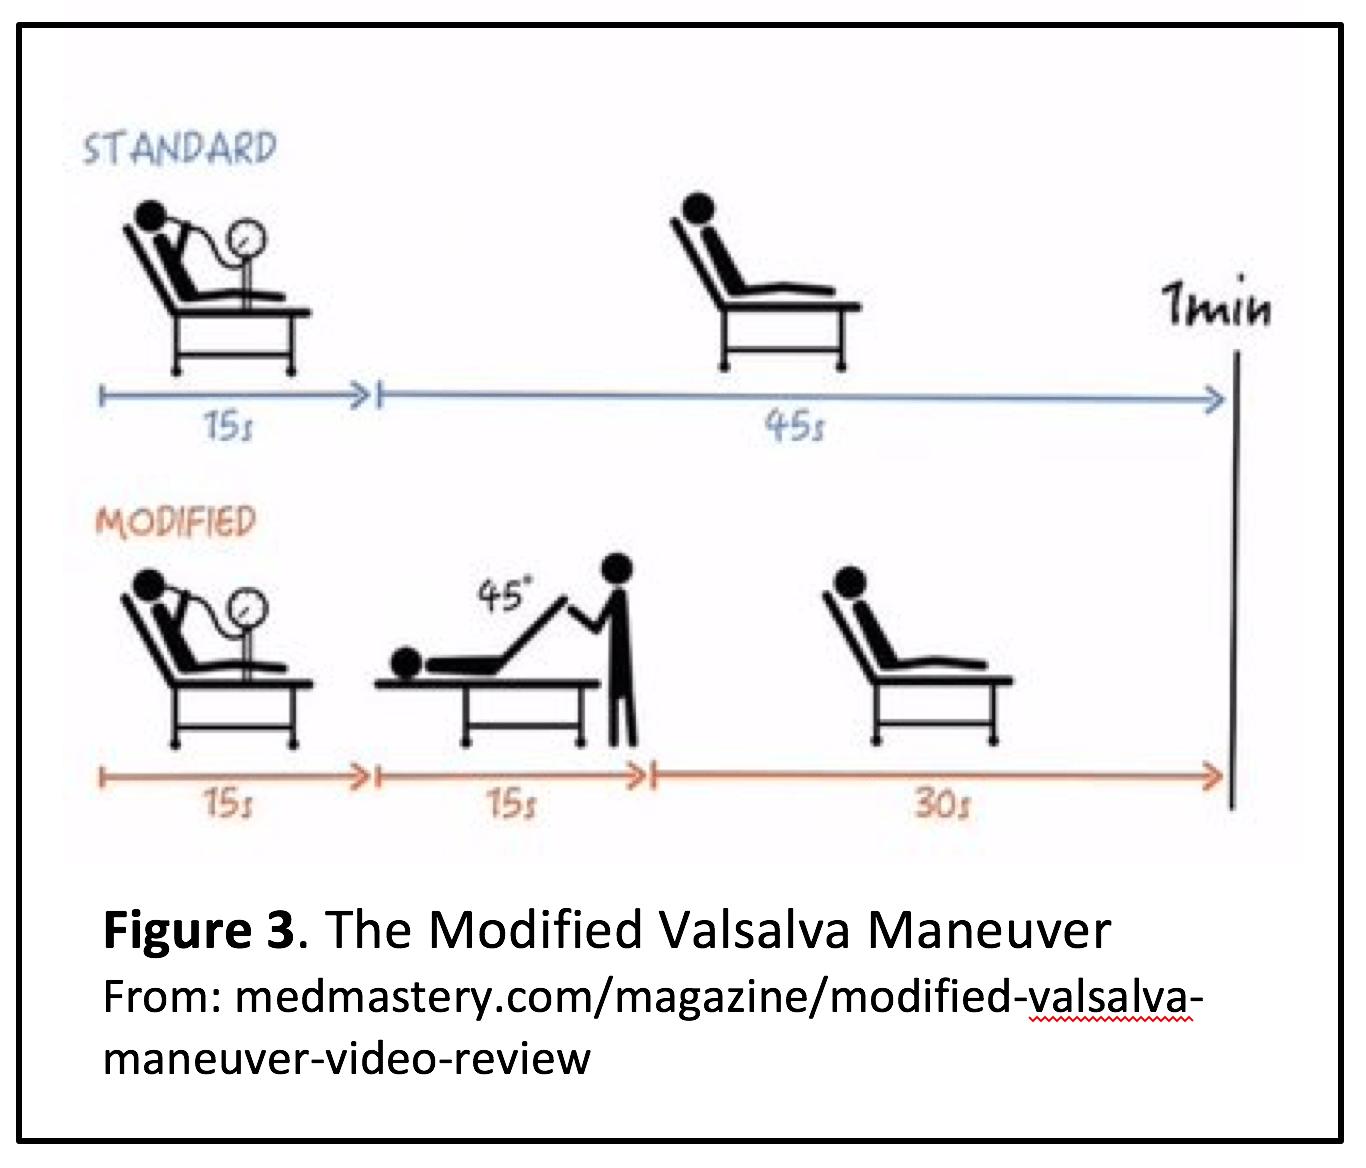 Modified Valsalva Maneuver Insturctions - 43% vs 17% response compared to the standard